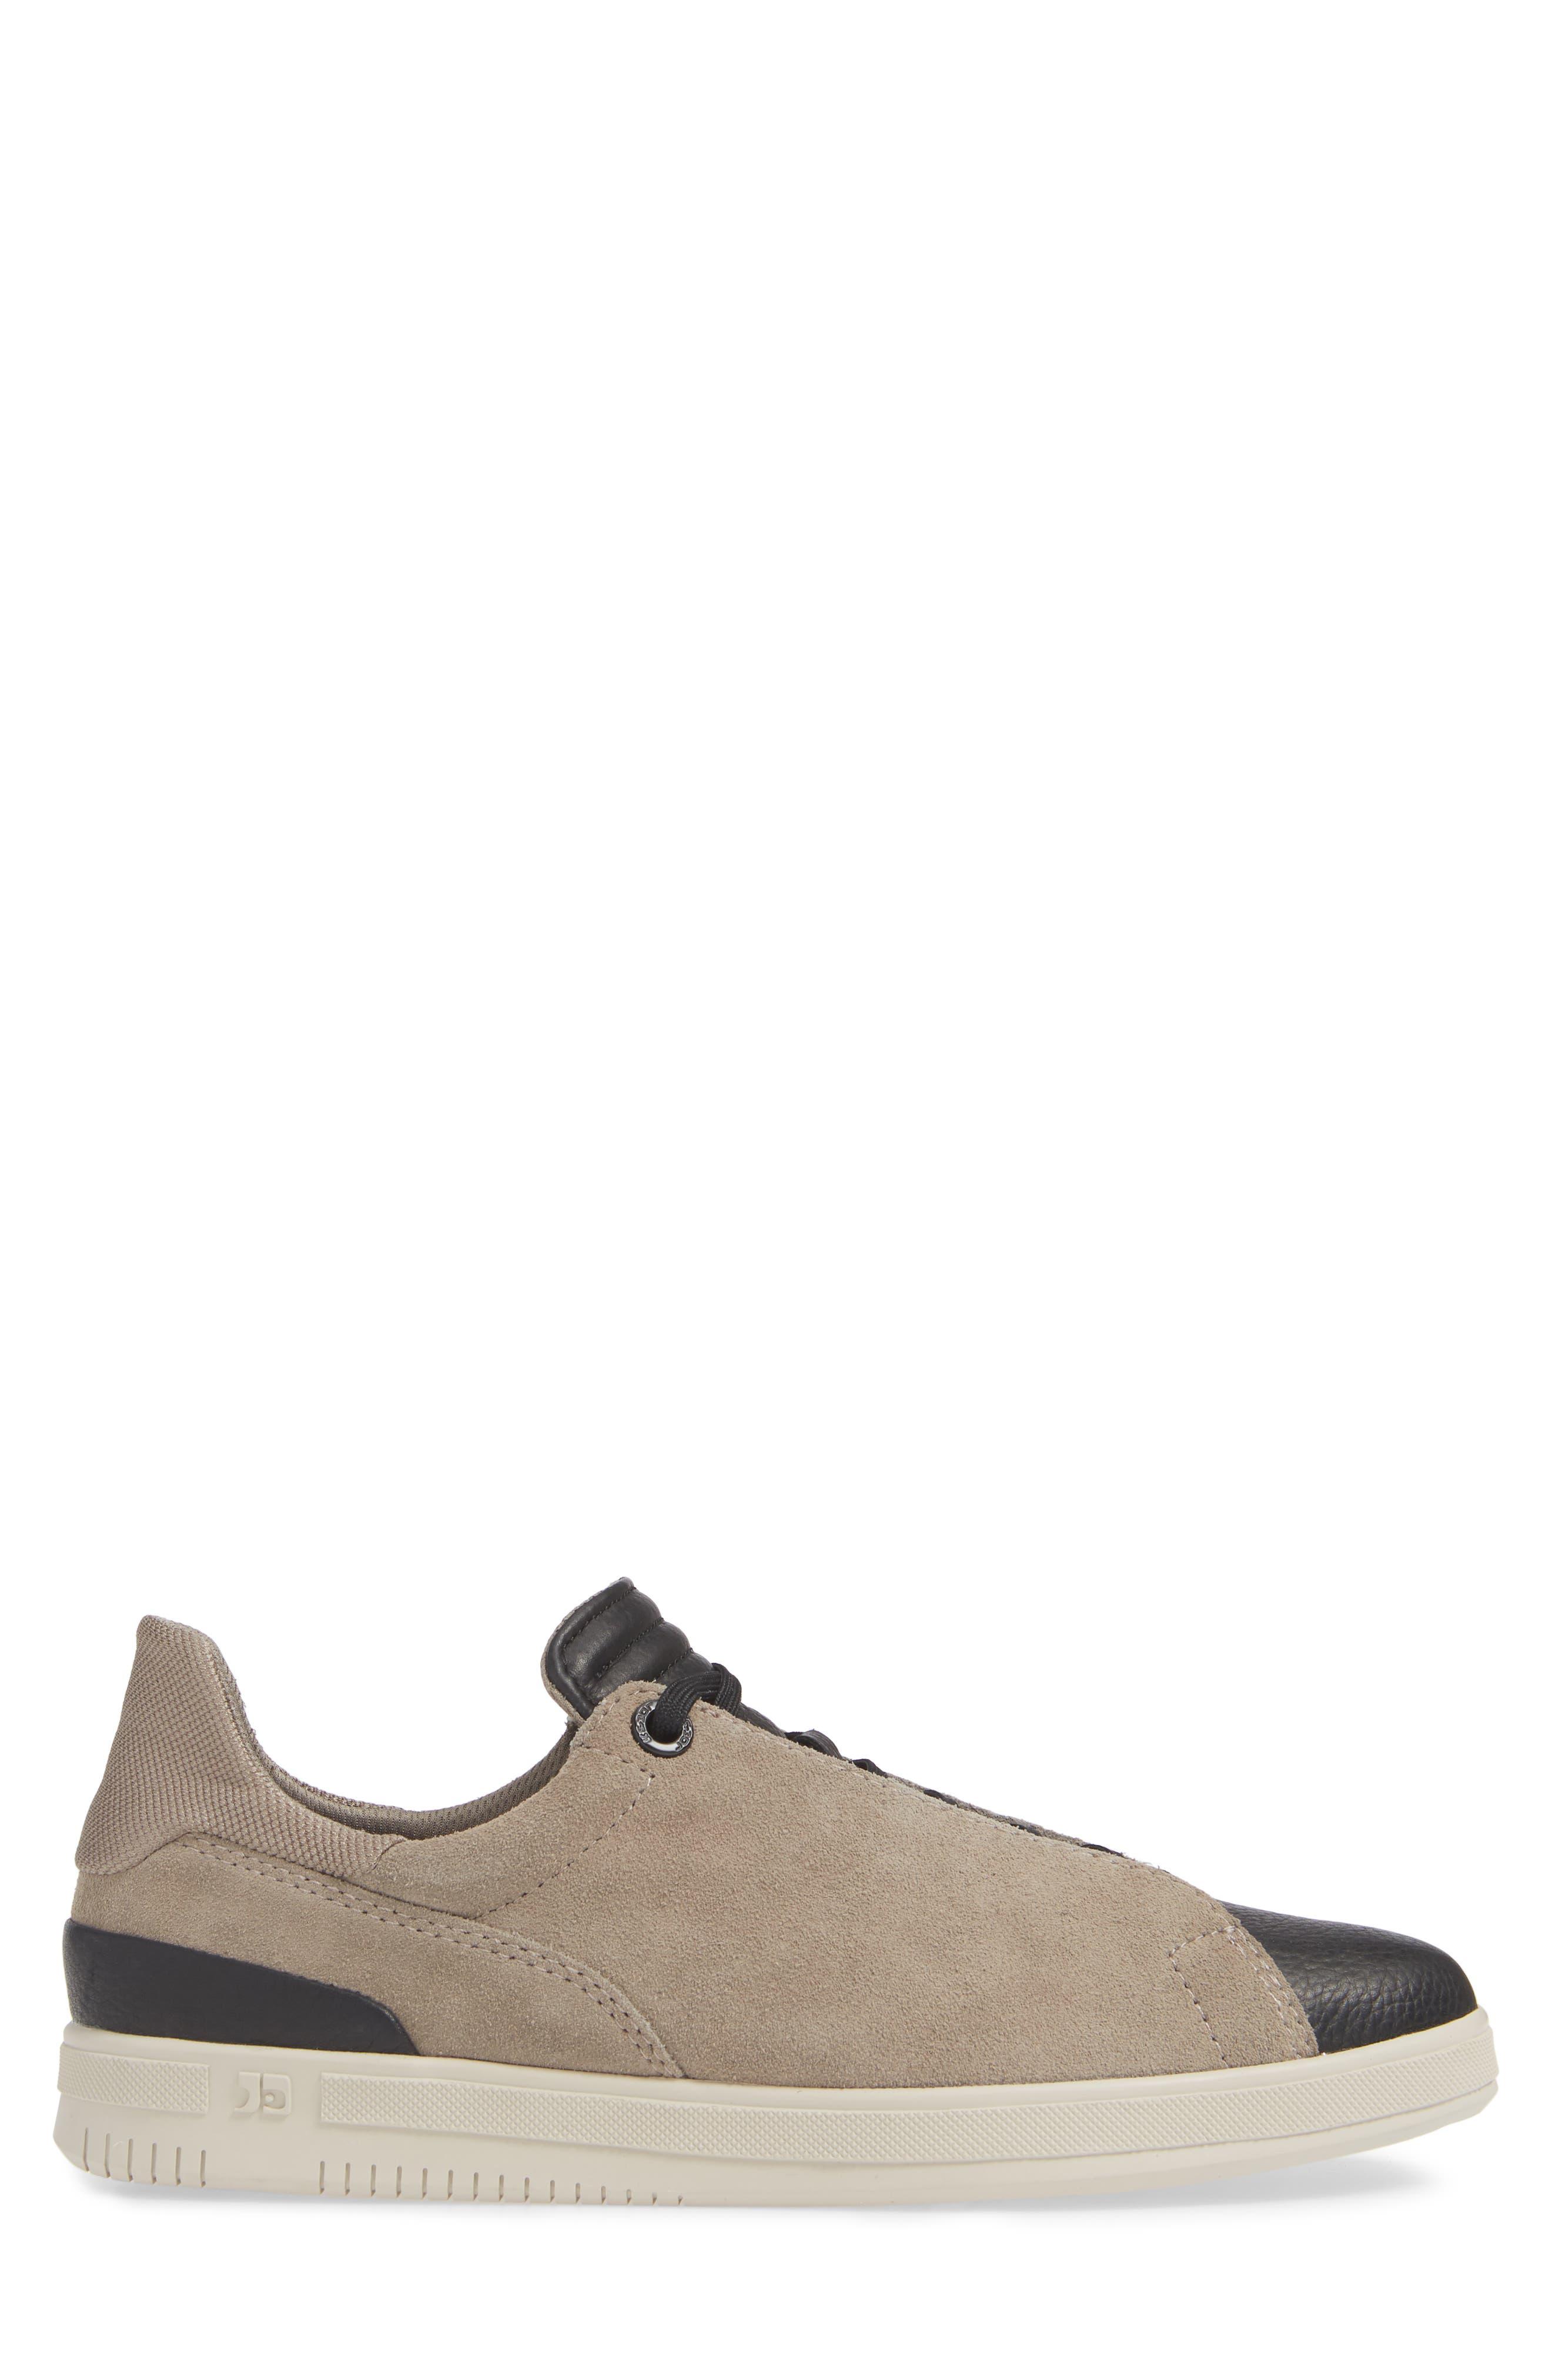 Joe Papa Low Top Sneaker,                             Alternate thumbnail 3, color,                             STONE/ BLACK